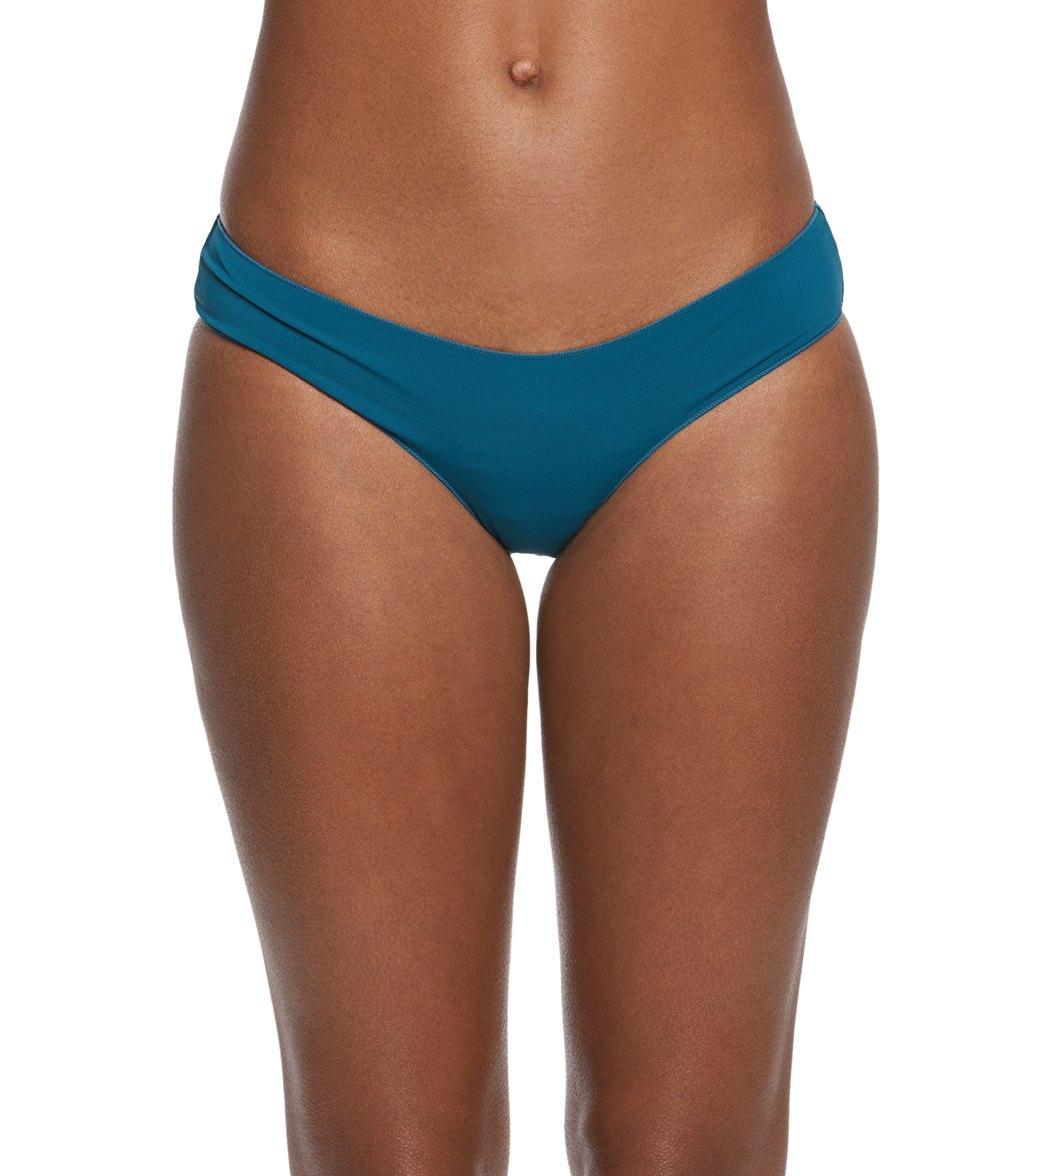 1cbe843779 Rip Curl Swimwear Classic Surf Hipster Bikini Bottom